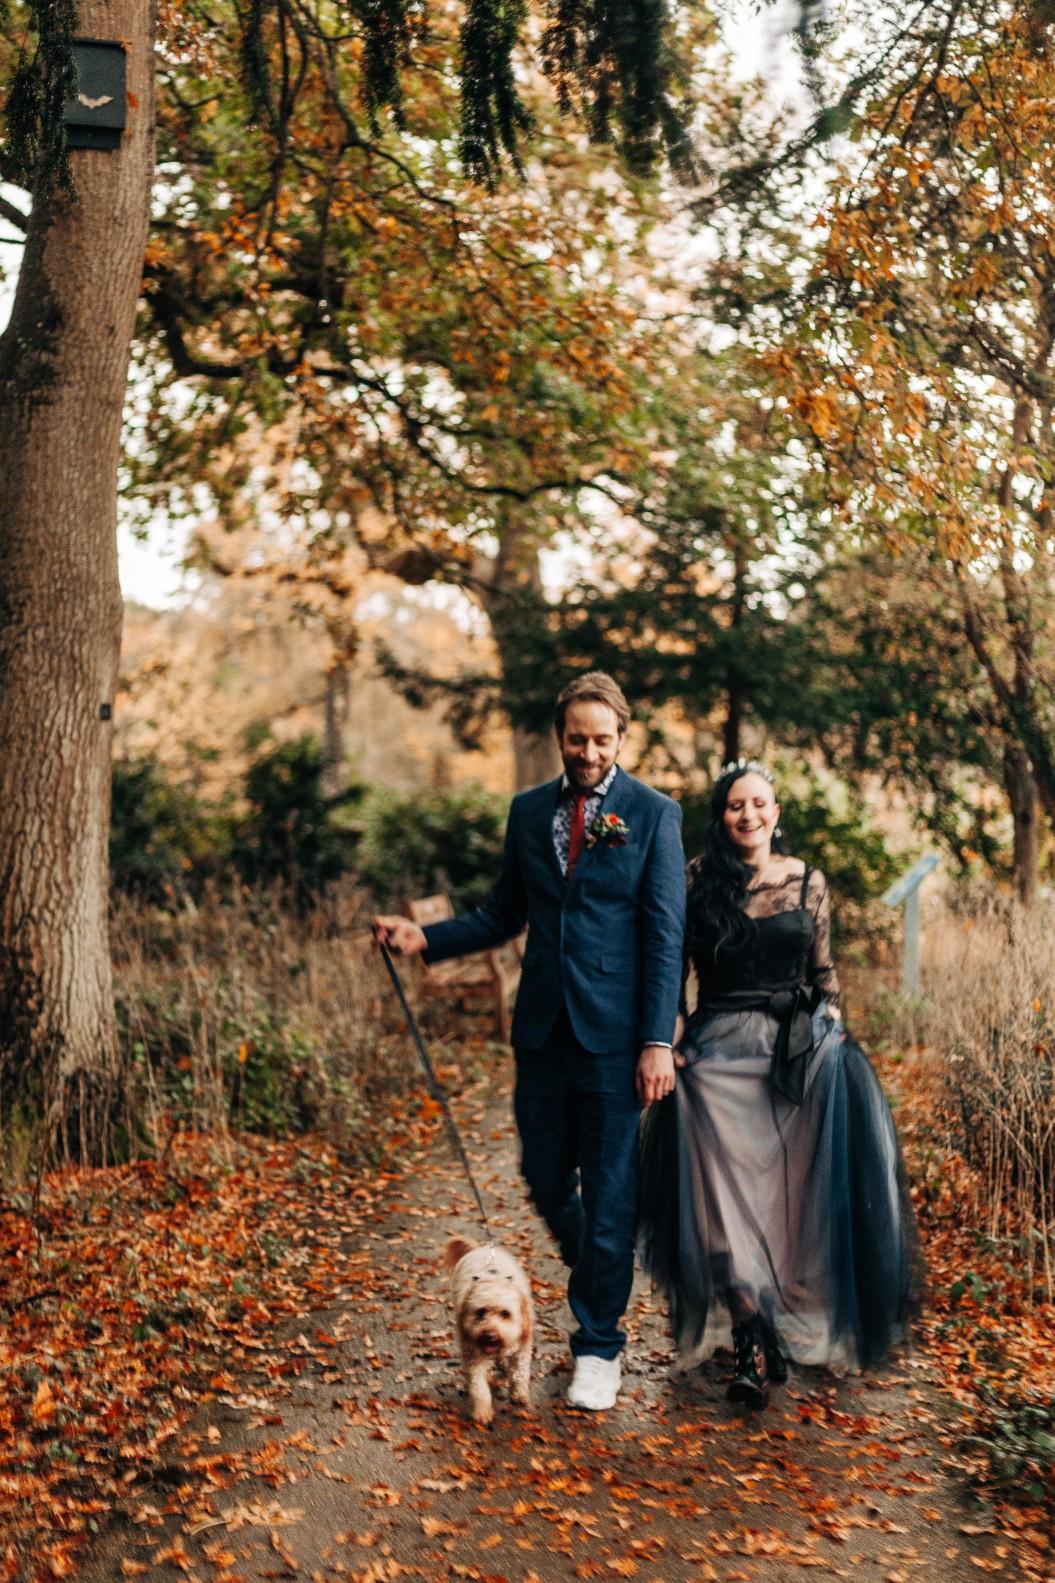 intimate alternative wedding - alternative micro wedding - small covid wedding